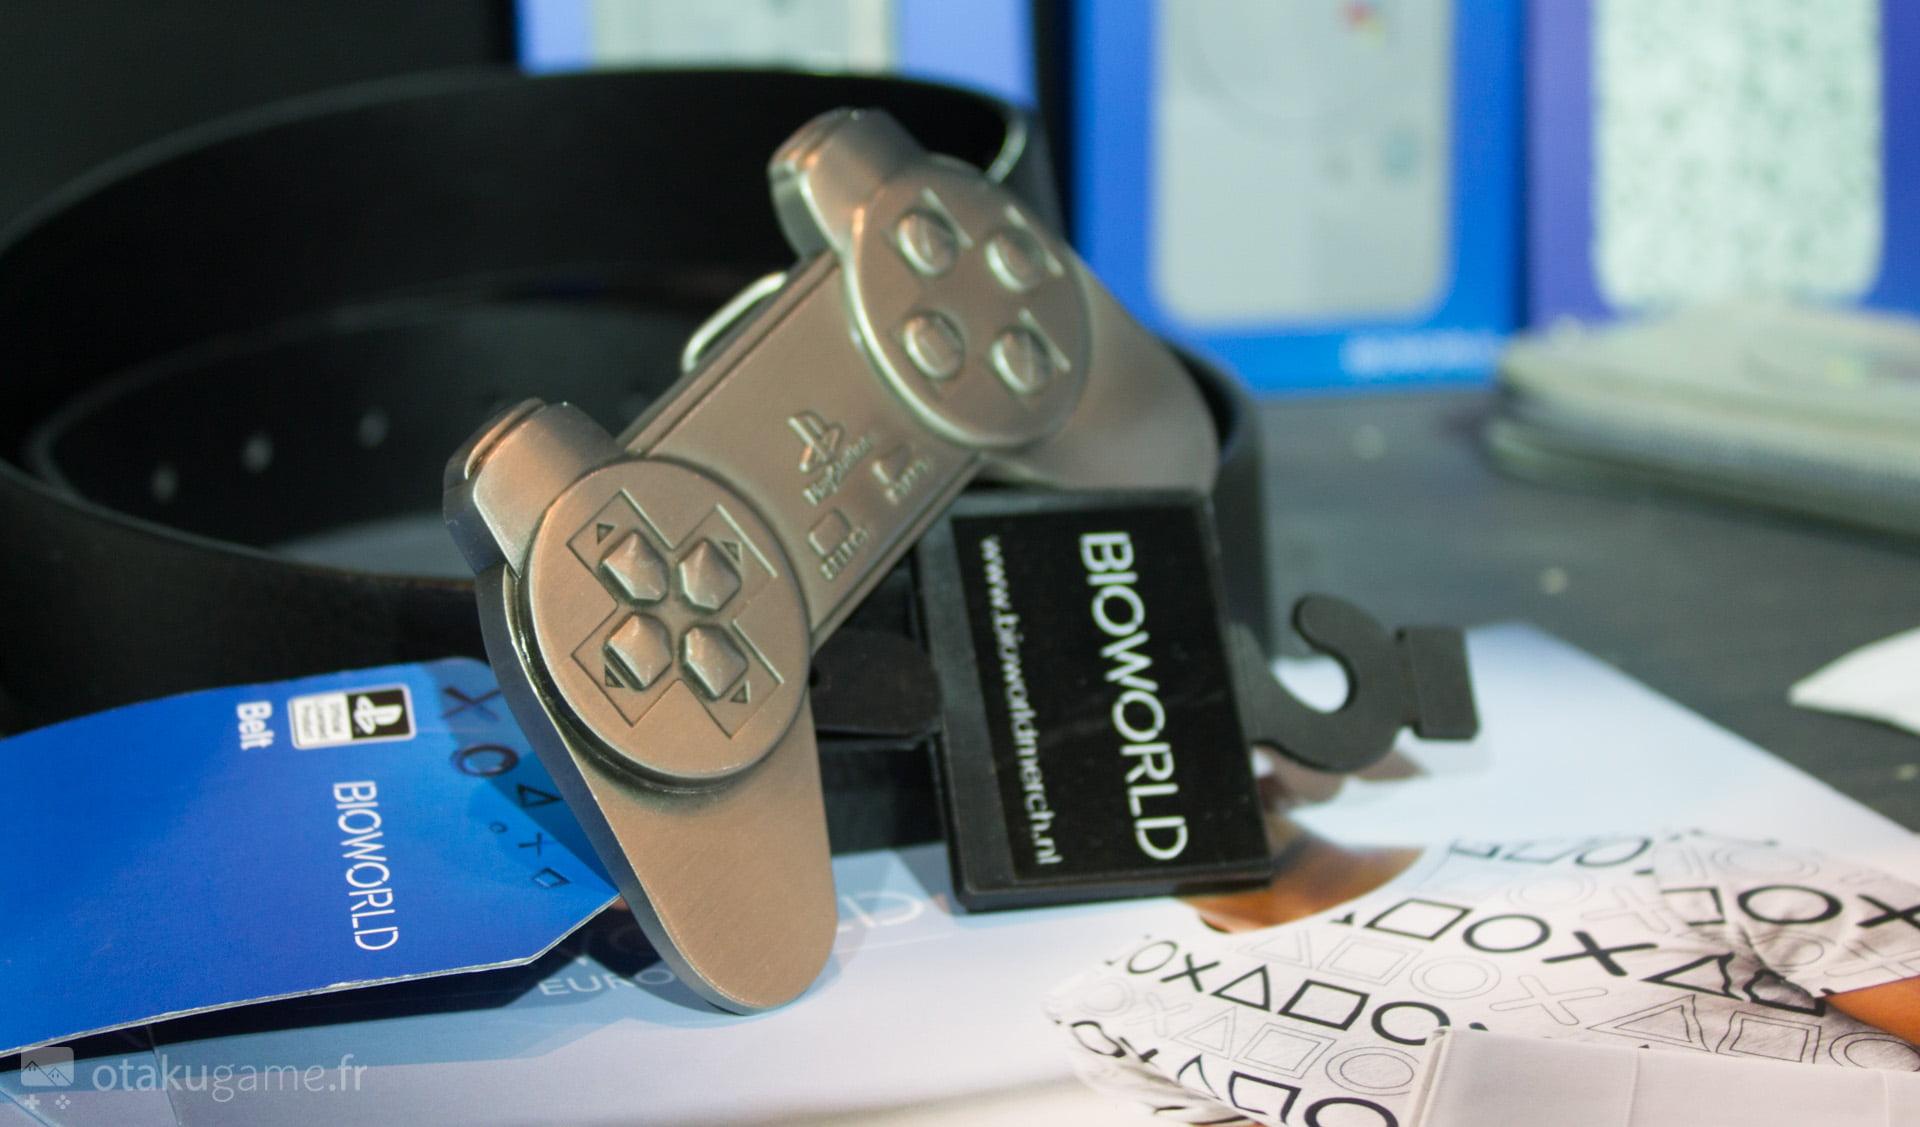 La (sublime) ceinture Playstation